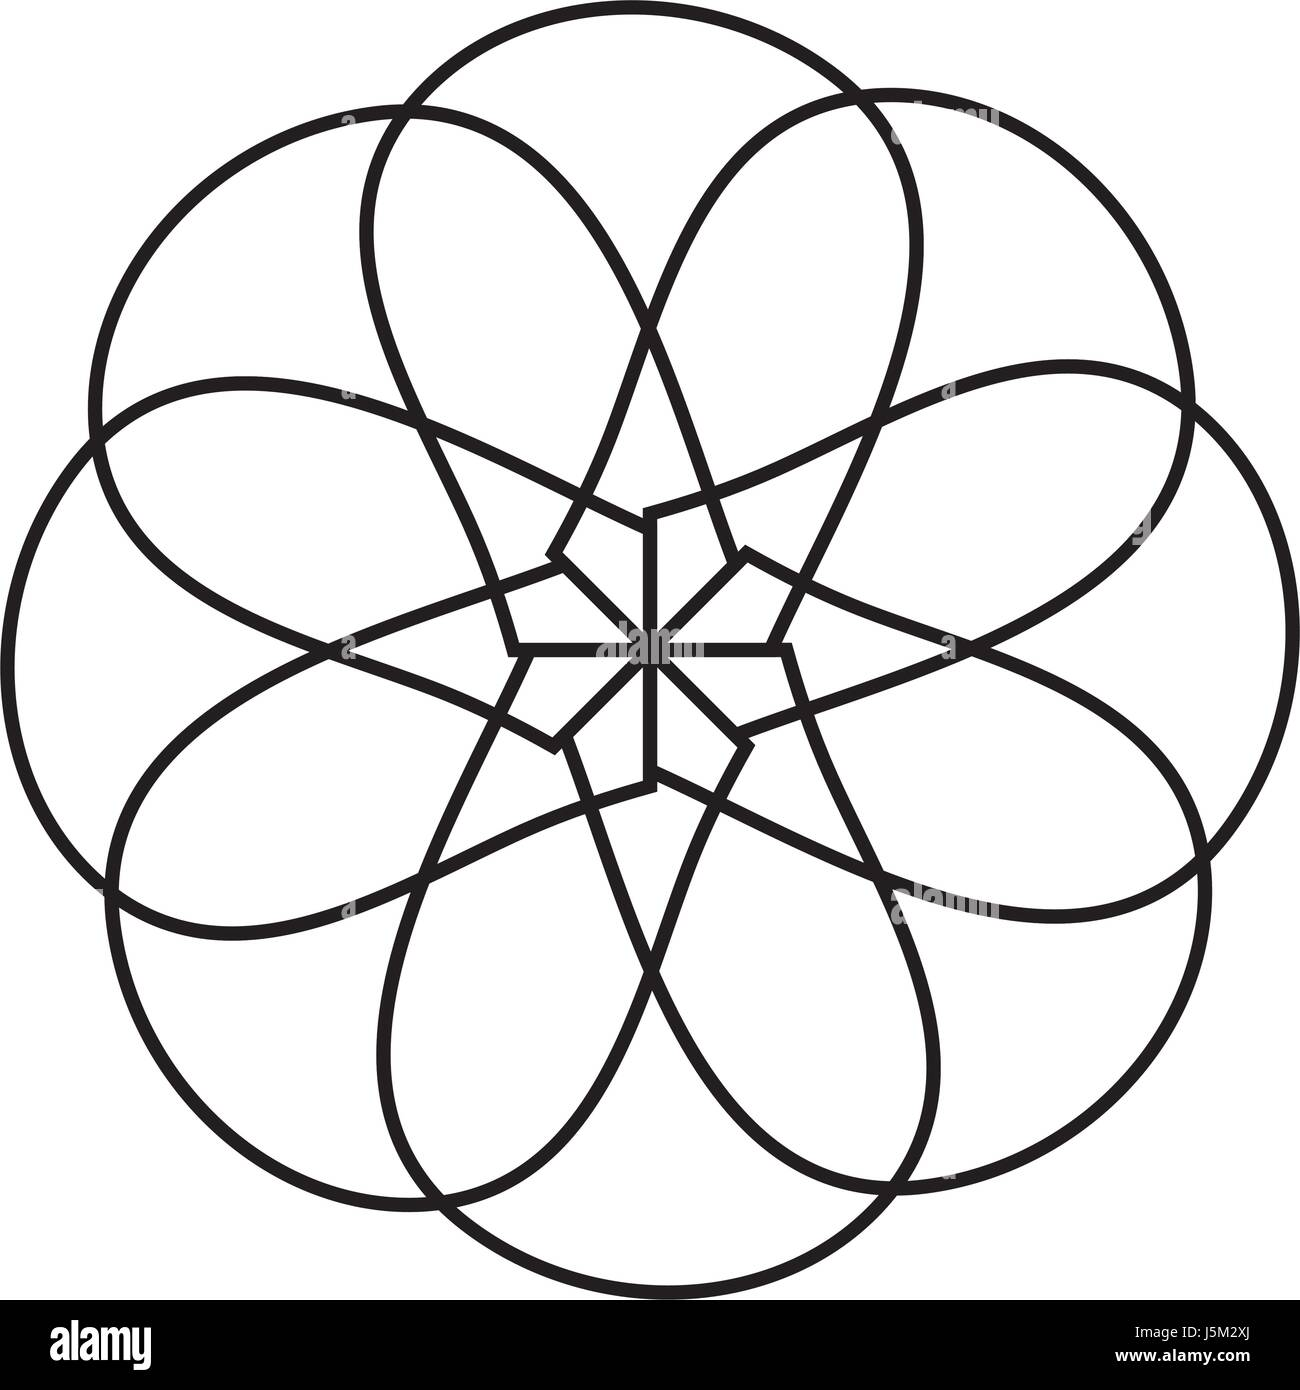 Symmetrical figure icon - Stock Image